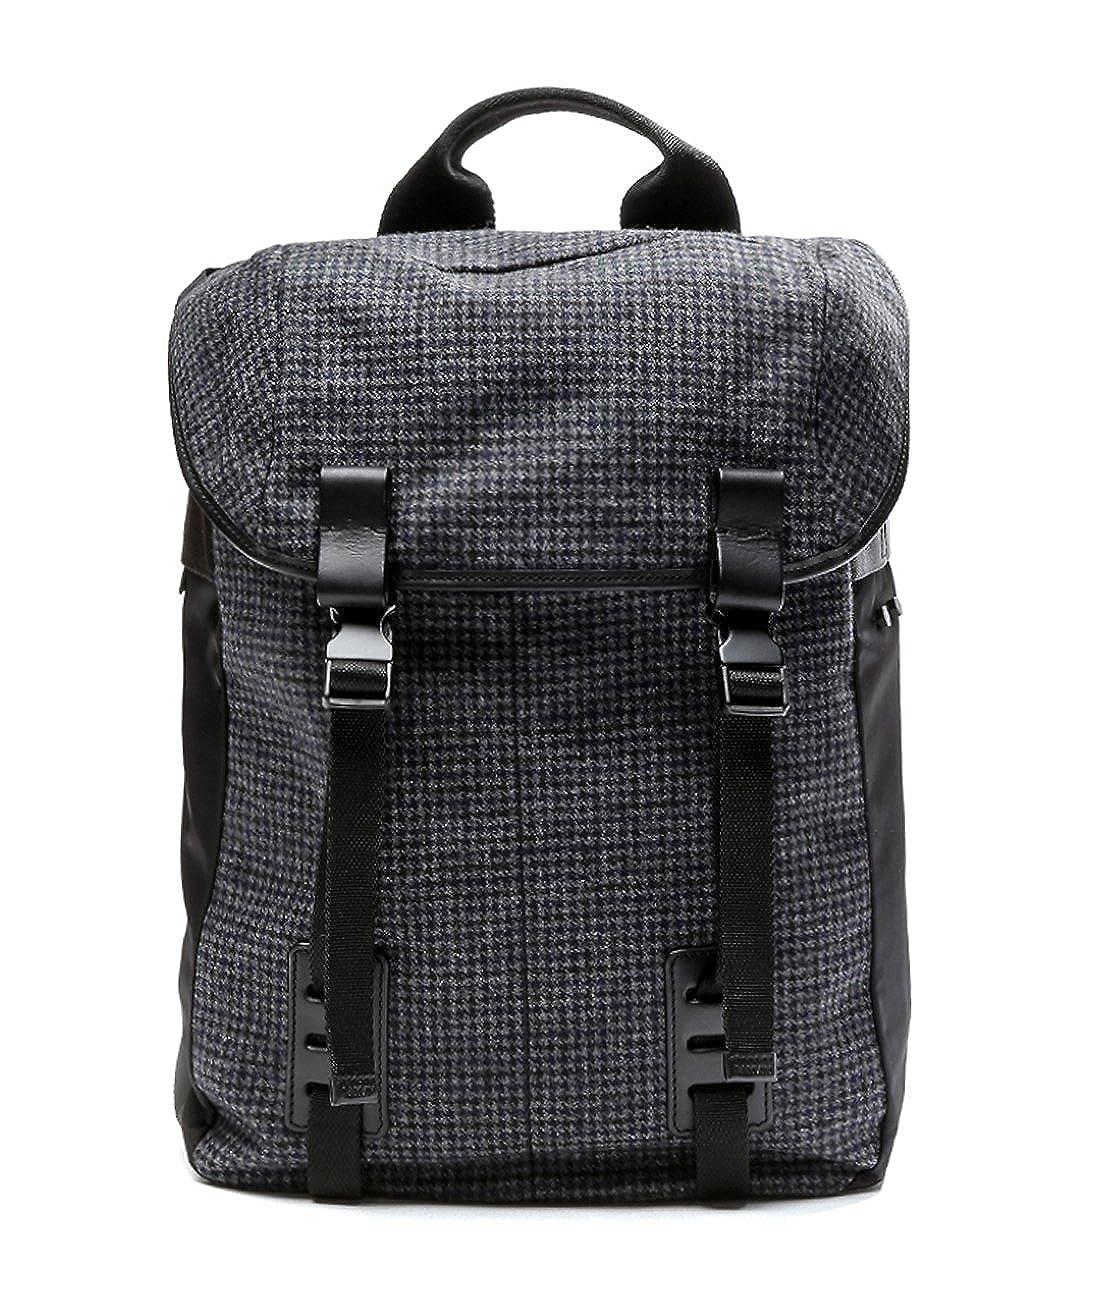 wiberlux Lanvinメンズ千鳥格子double-buckleトップフラップバックパック One Size  B01B4FISHQ